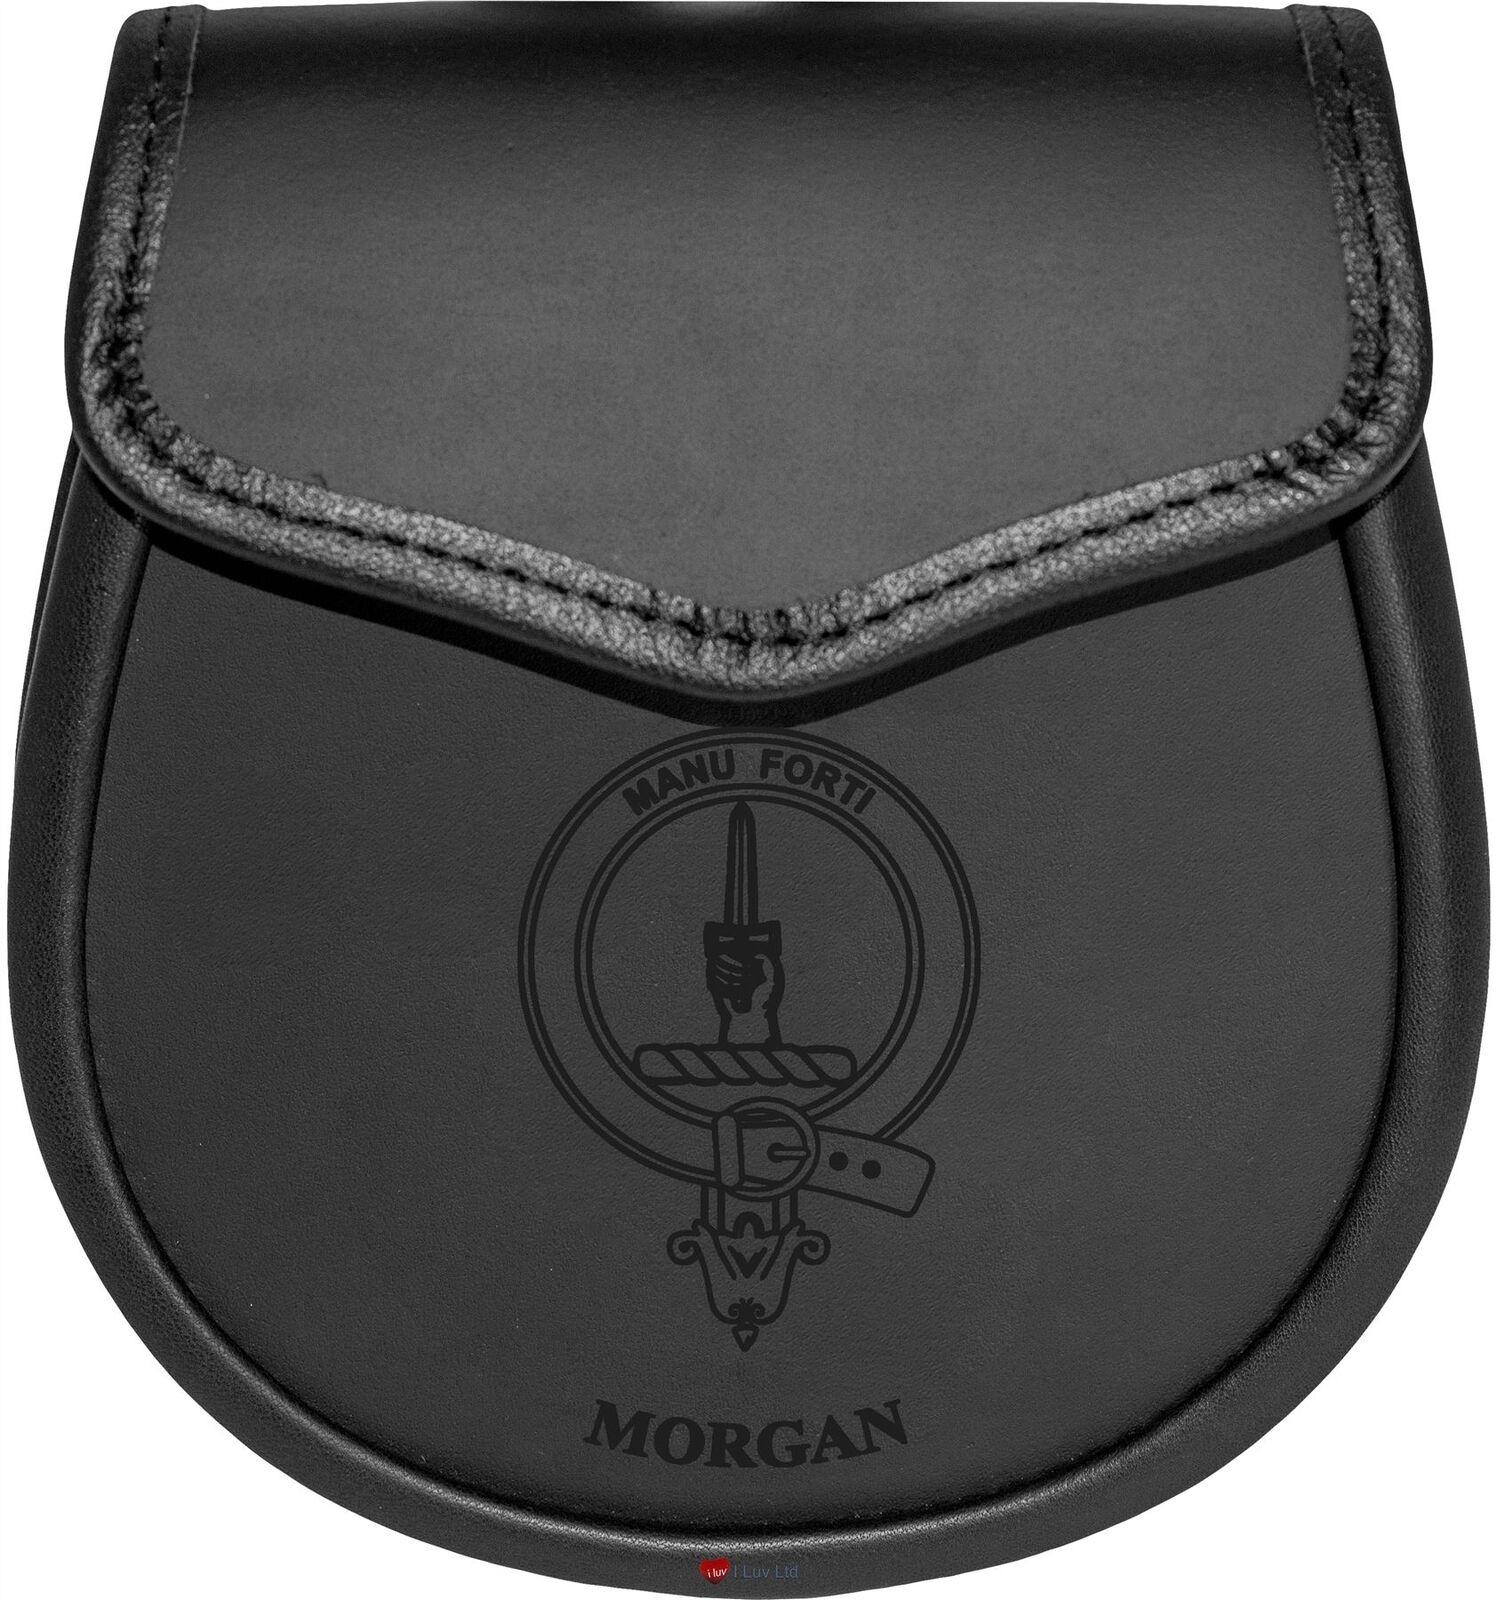 Morgan Leather Day Sporran Scottish Clan Crest